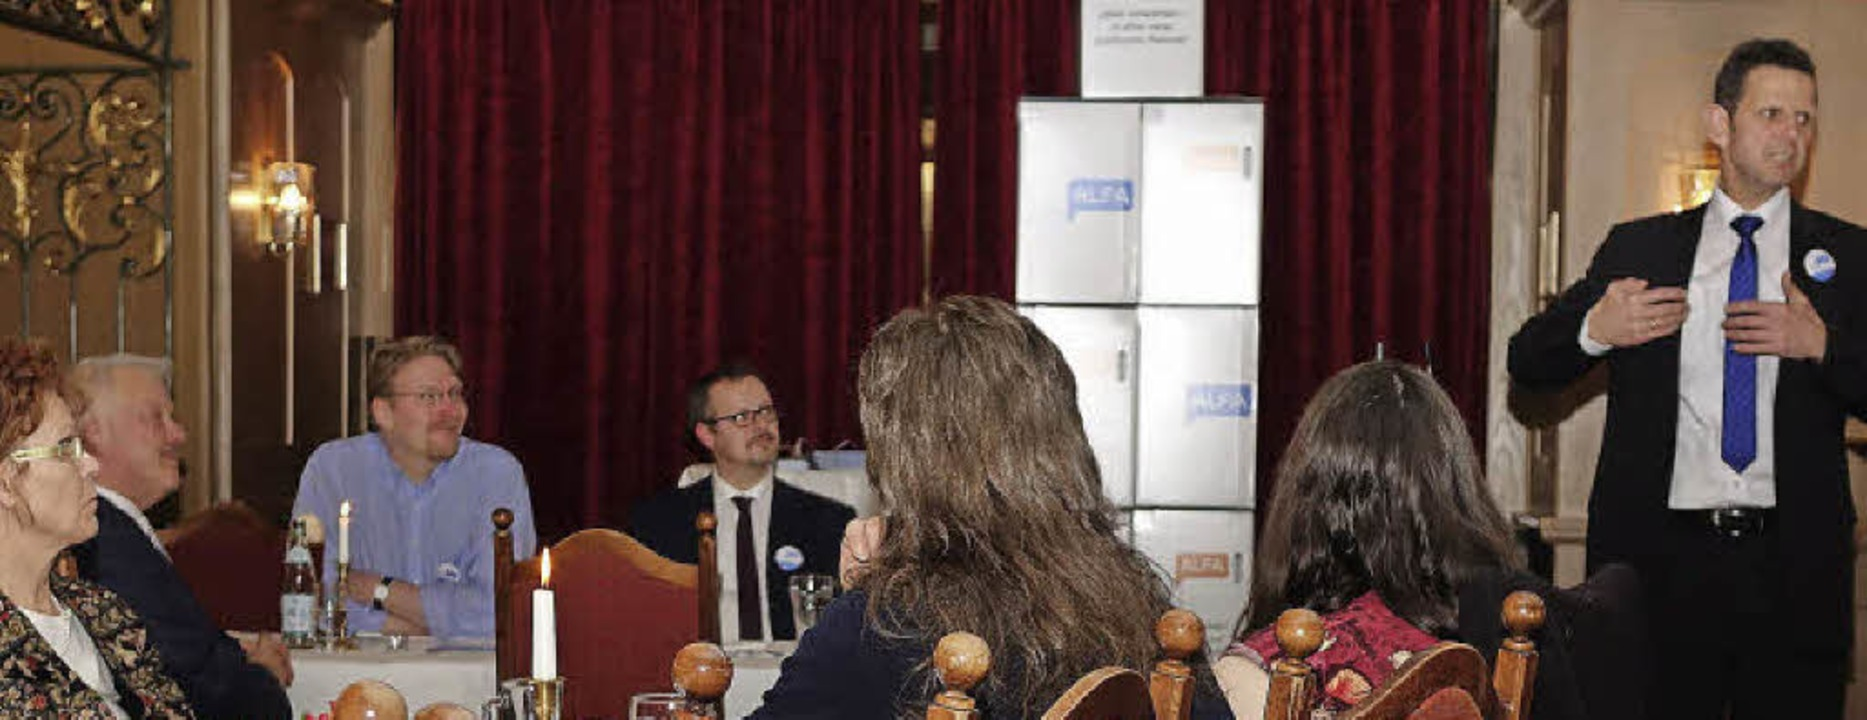 Bernd Kölmel (re.), ehemals AfD und je...hlveranstaltung zur Landtagswahl vor.   | Foto: Hege